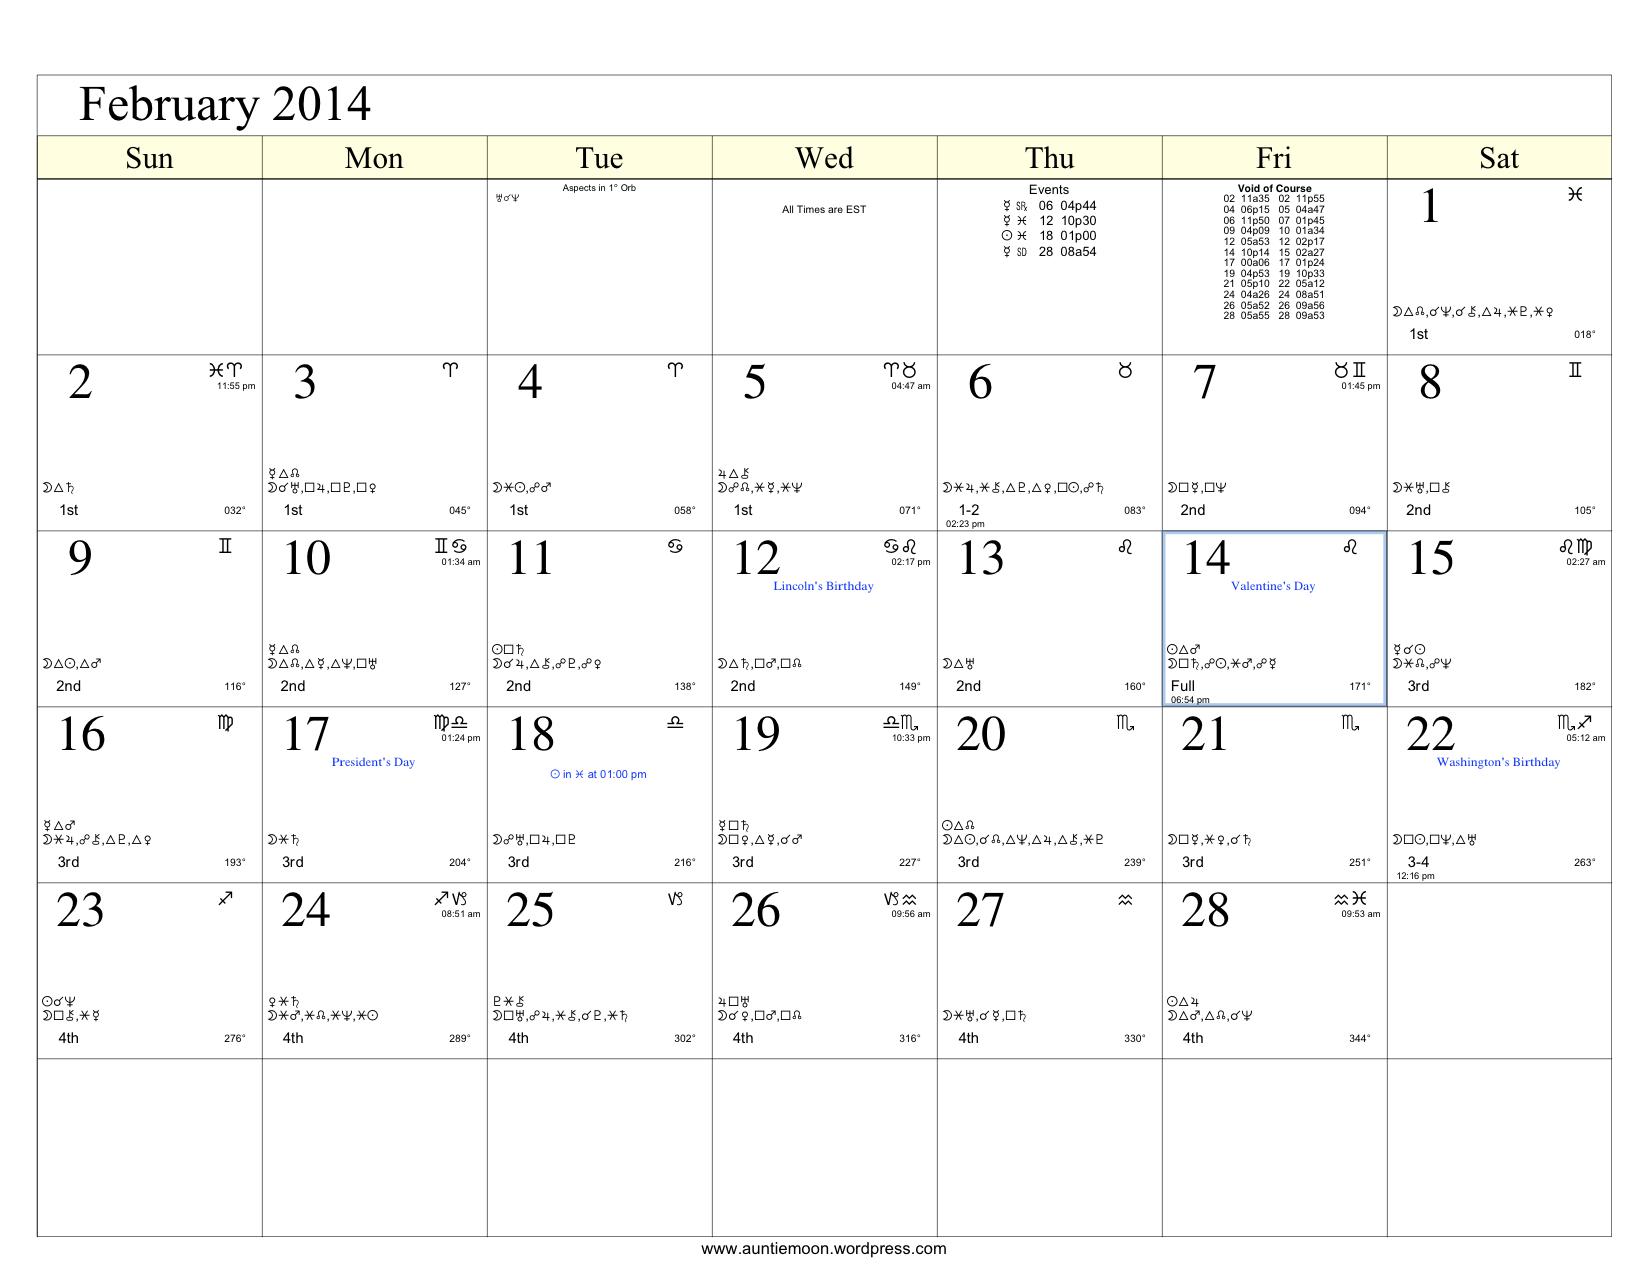 2014 Lunar Calendar_Lunar Phase Calendar 2014_Chinese Calendar 2014